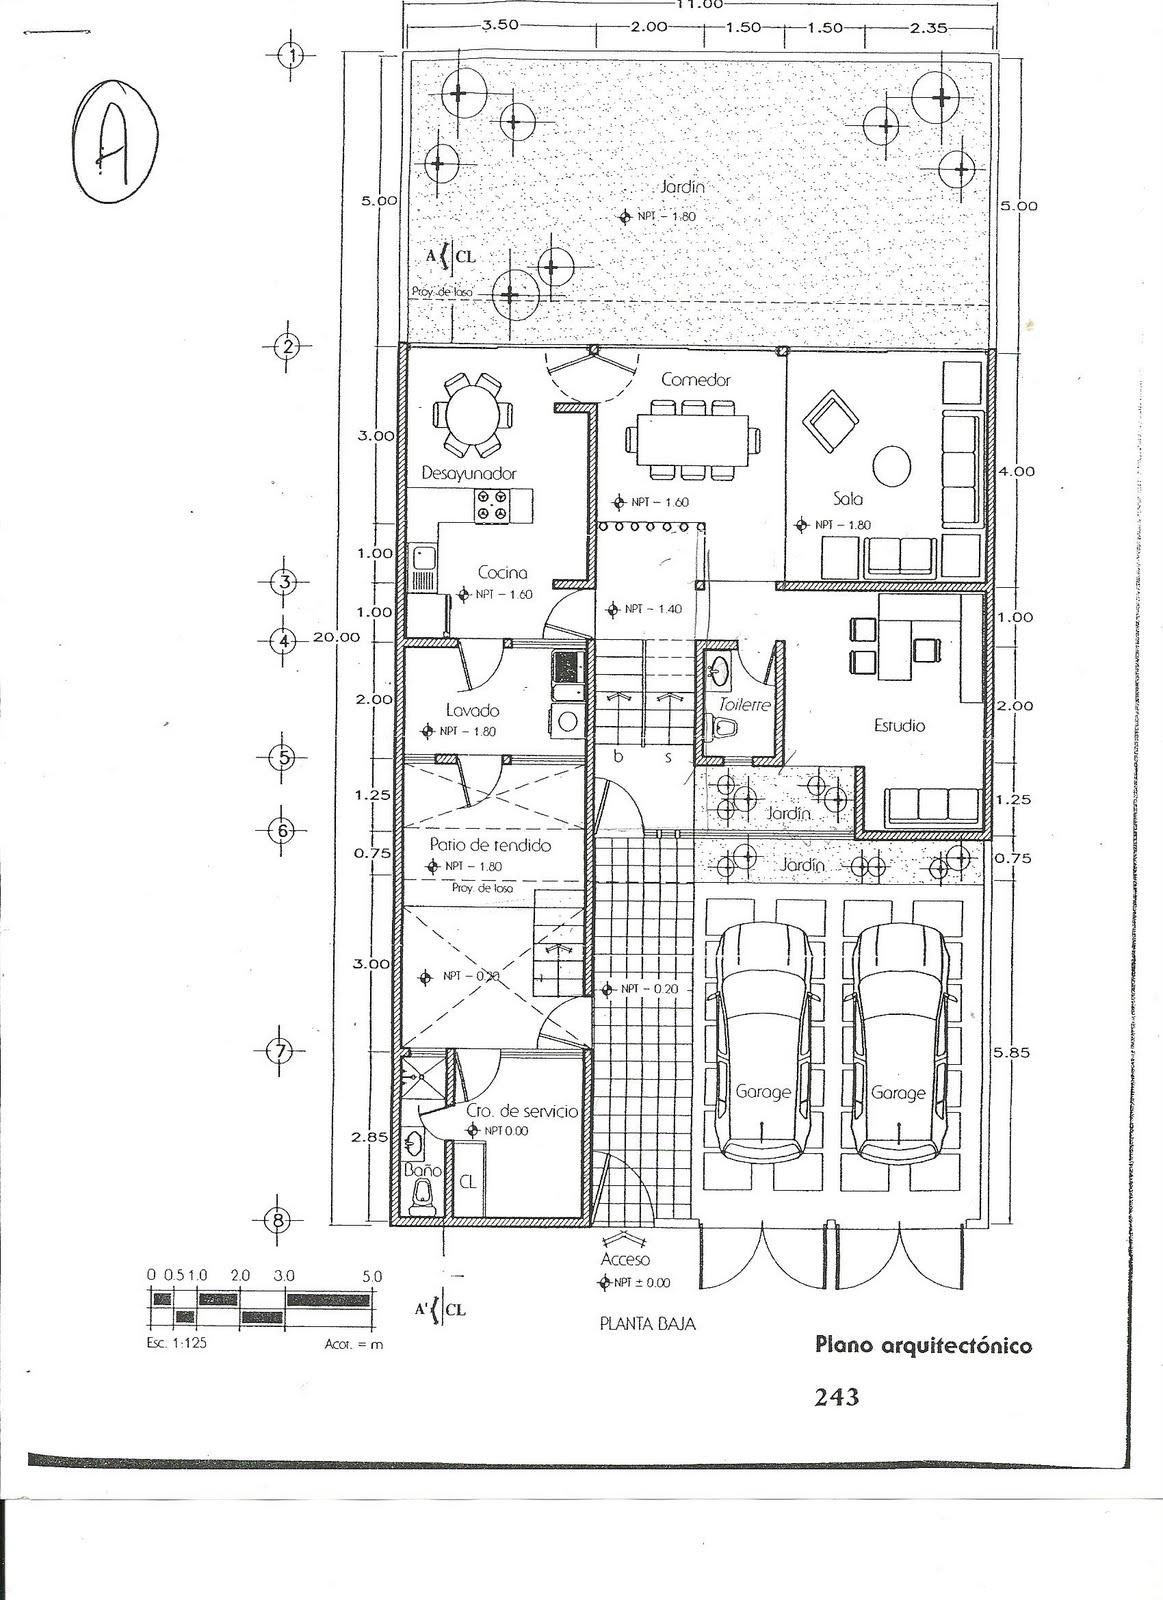 Plano arquitectonico casa habitacion pdf novel drug for Pie de plano arquitectonico pdf